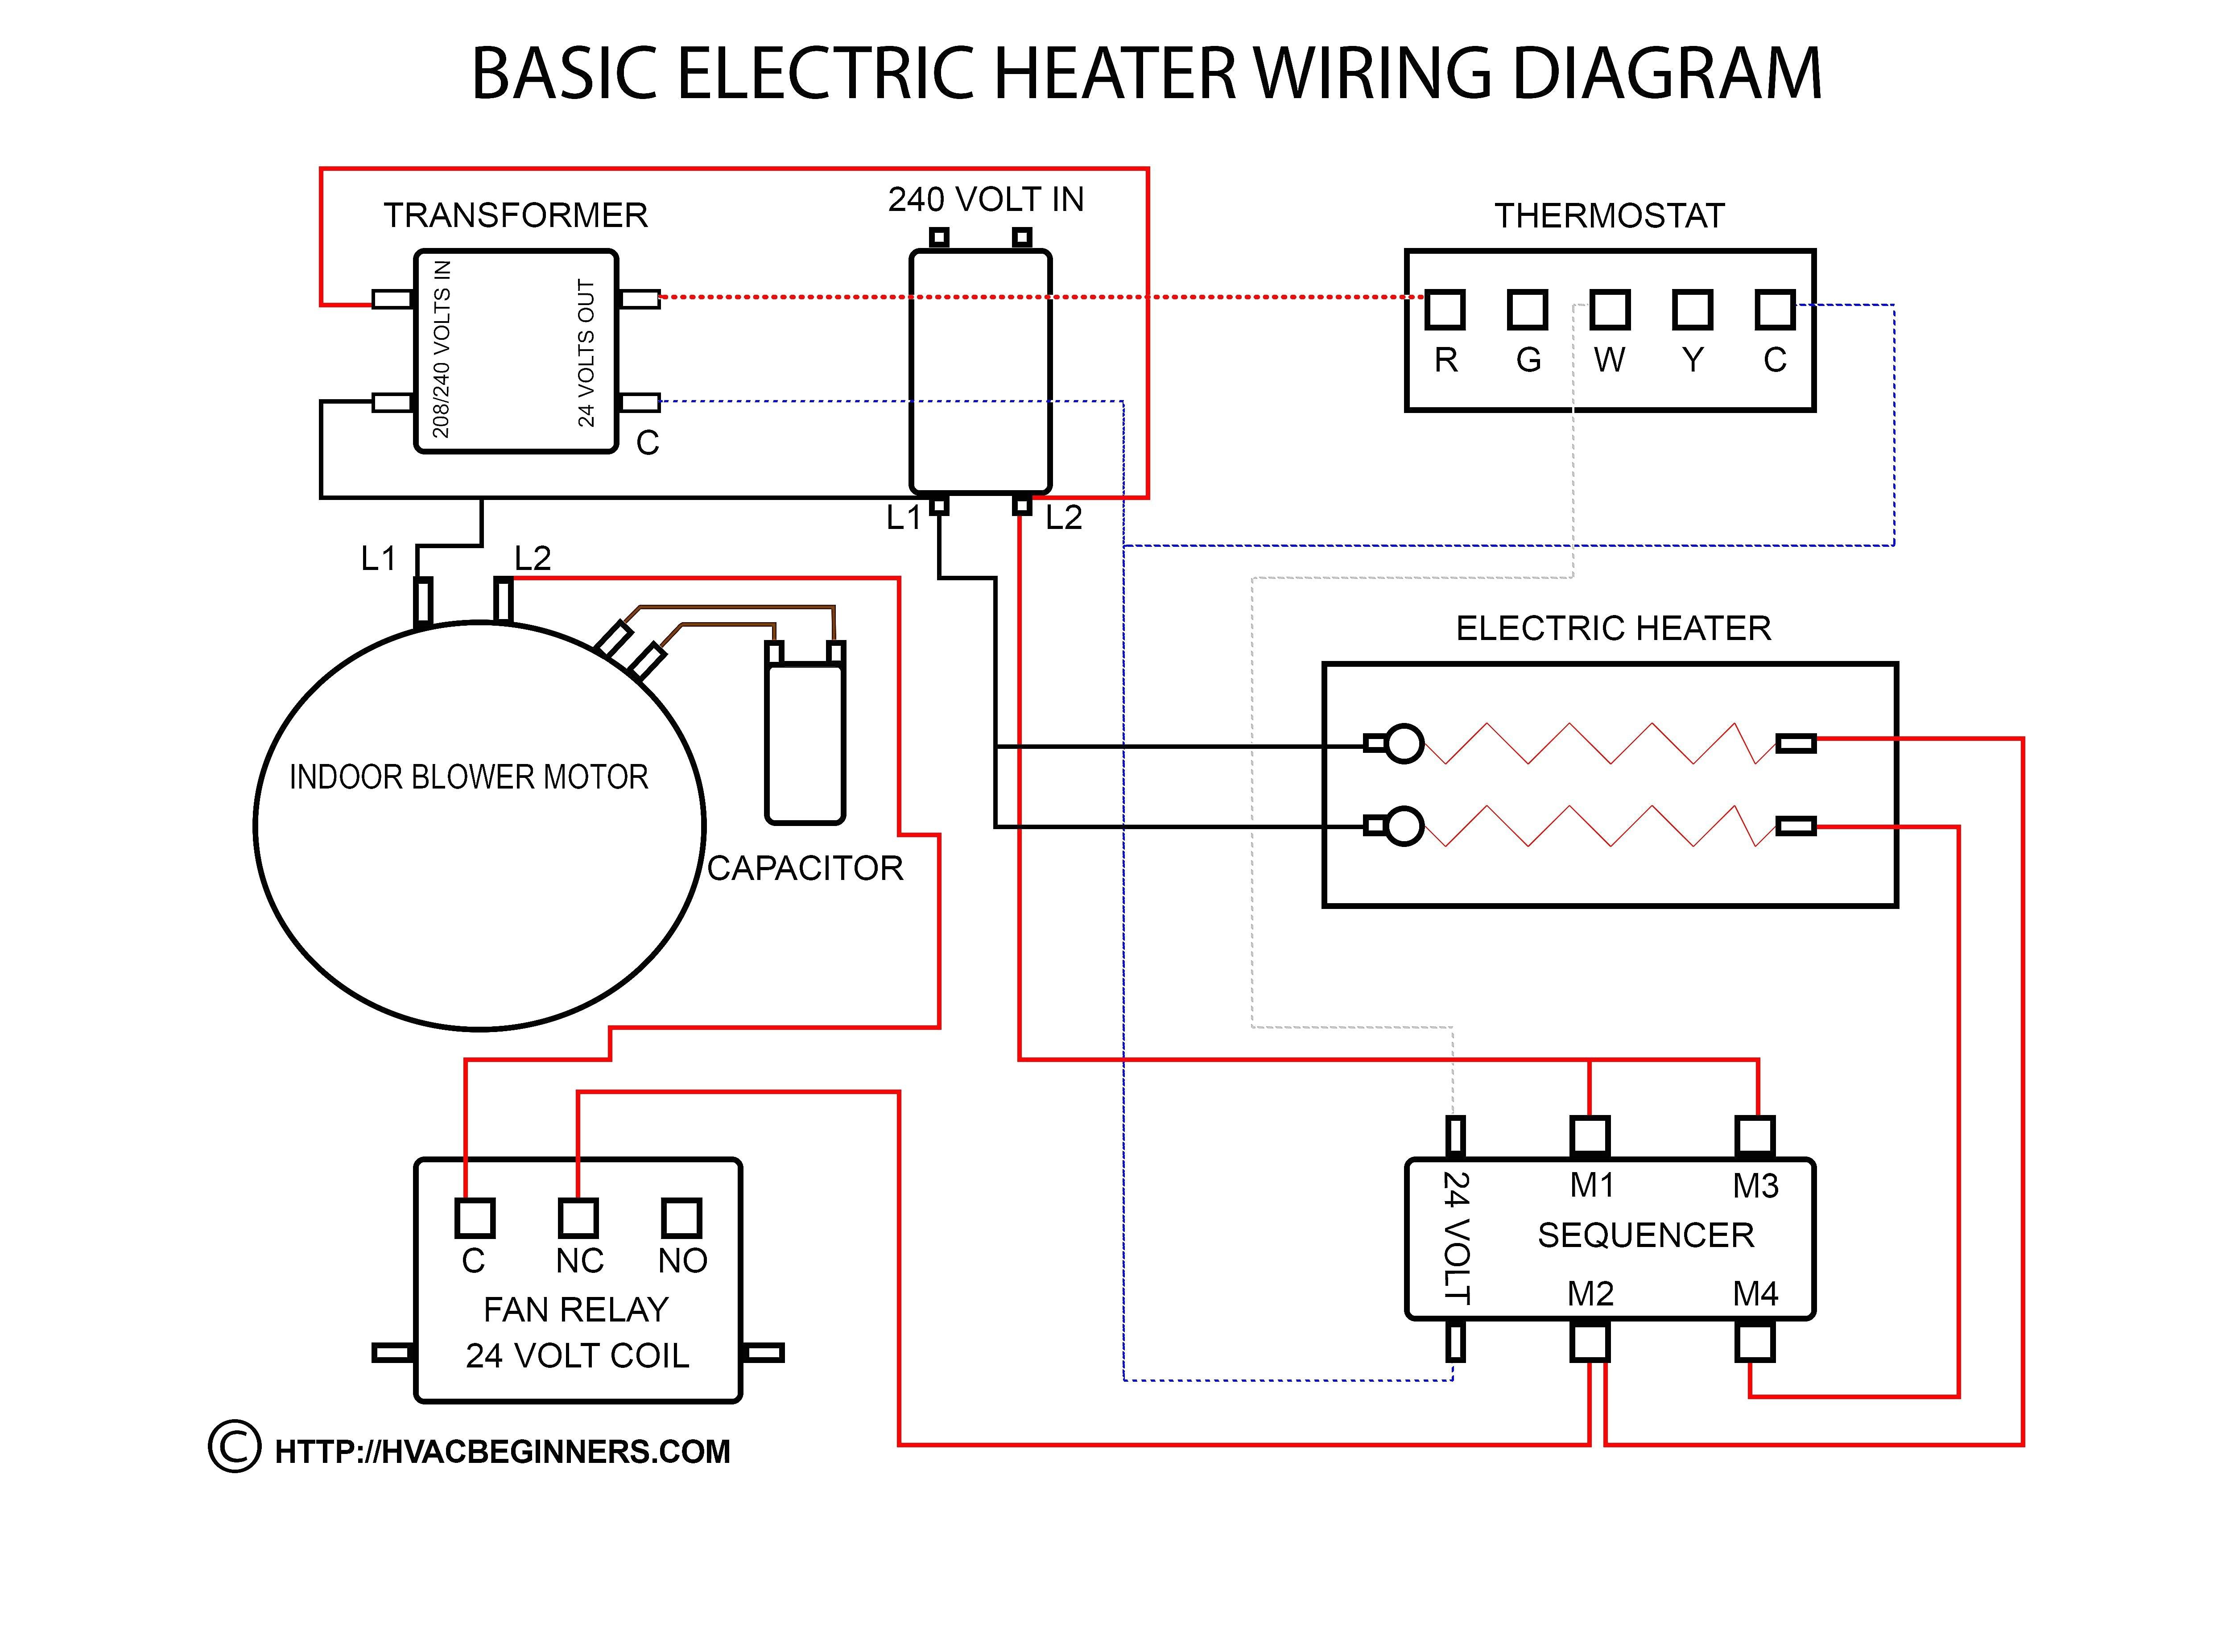 120 Volt to 24 Volt Transformer Wiring Diagram 24v Transformer Wiring Diagram Wiring Diagram Centre